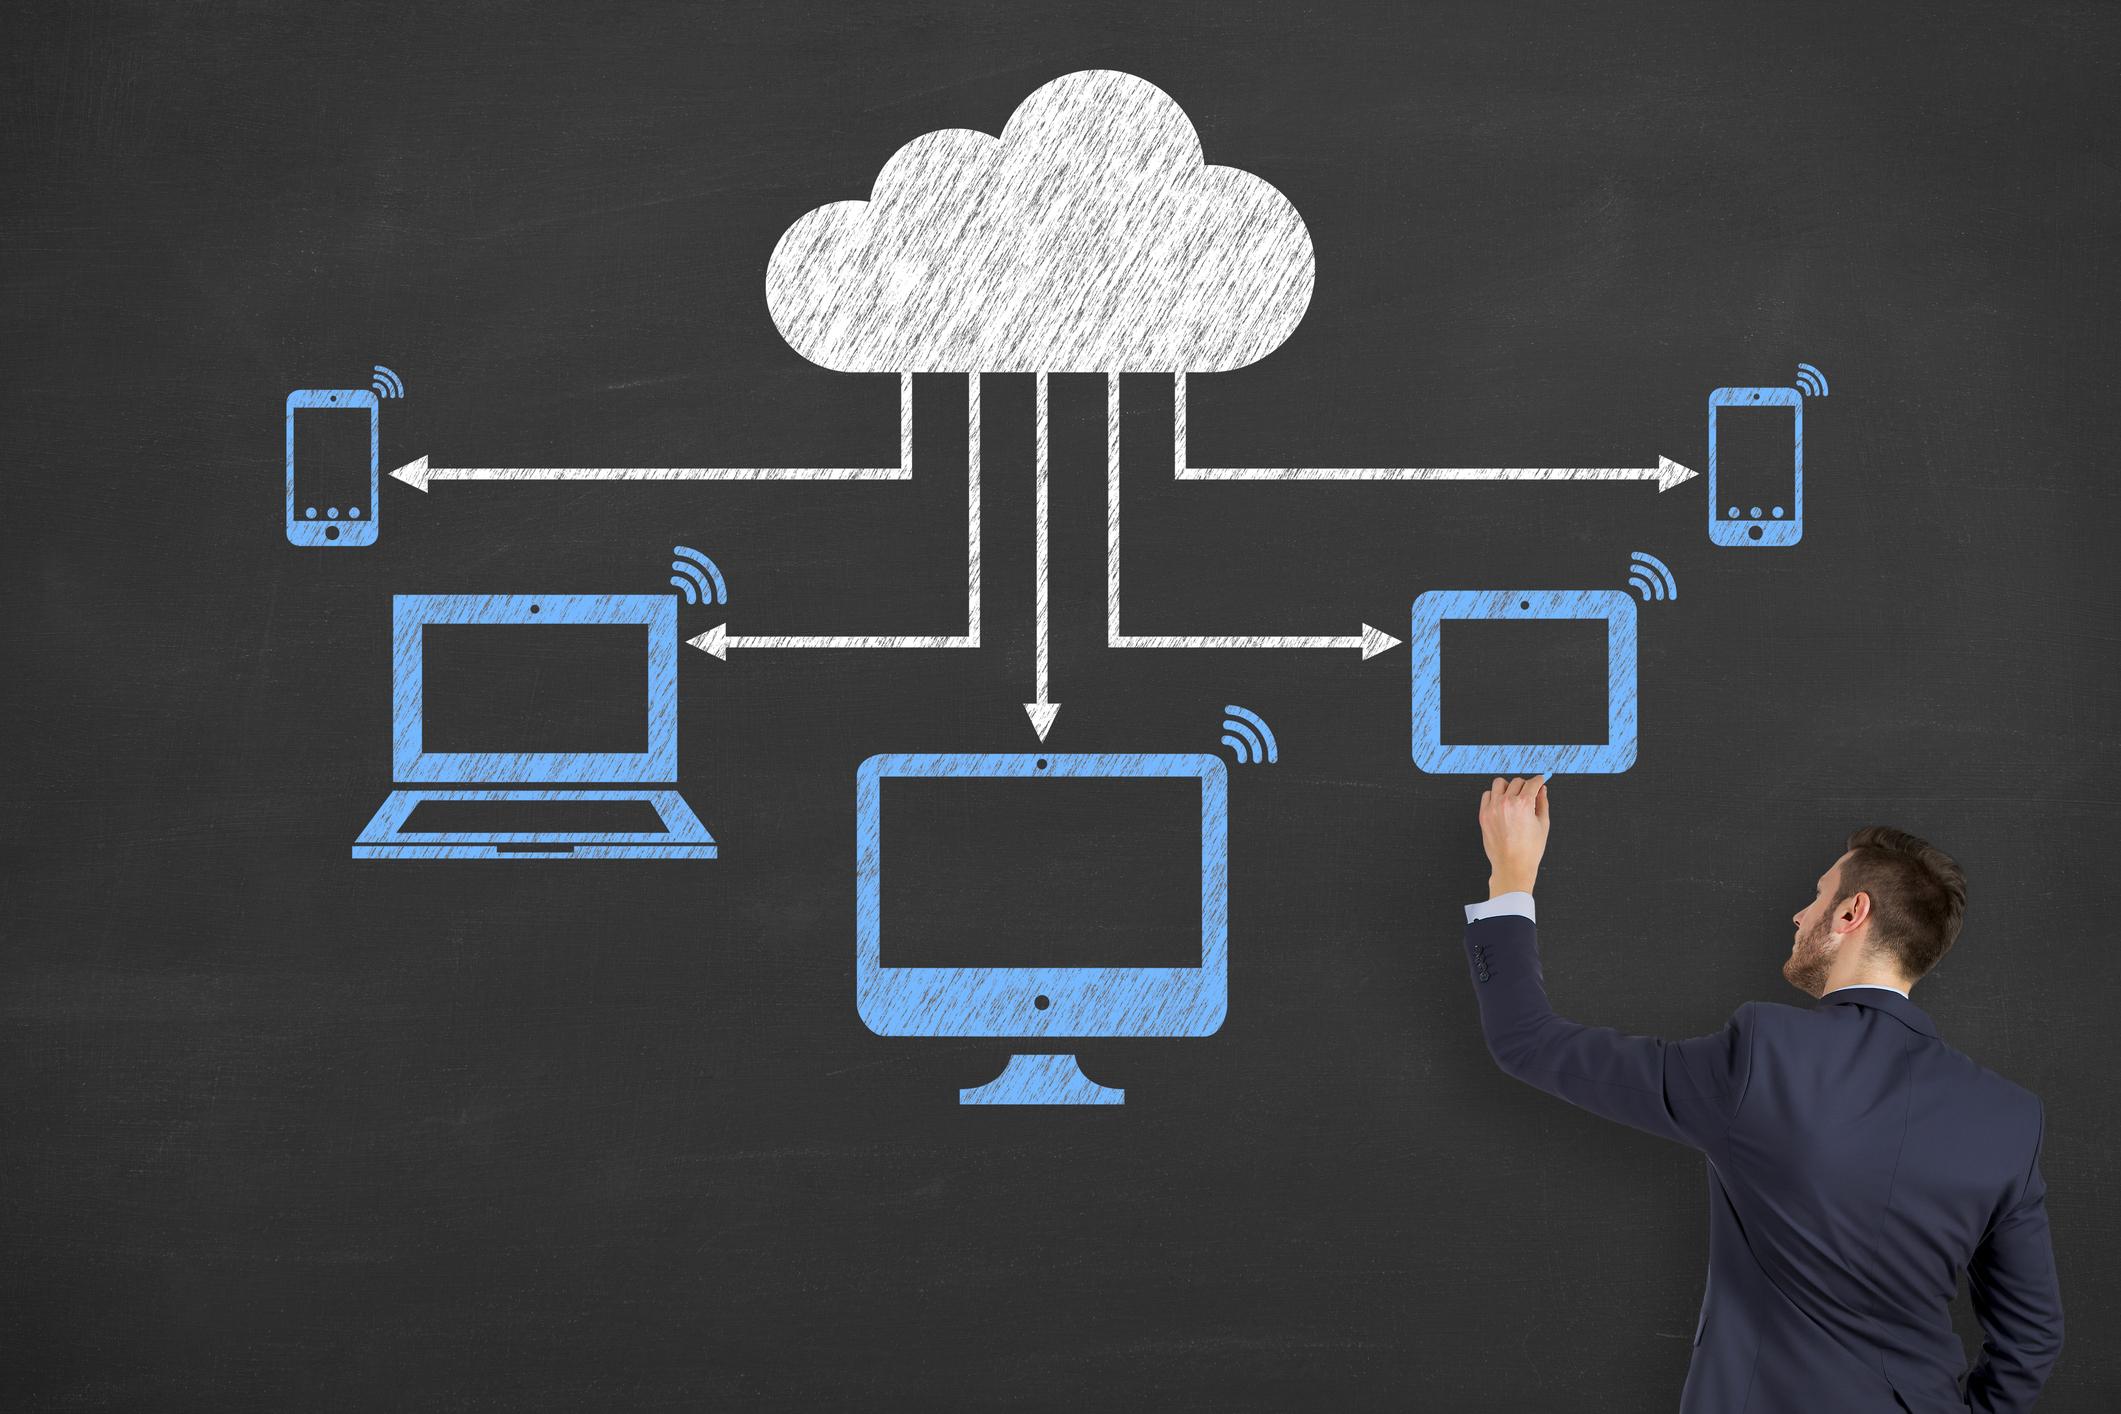 Cloud computing diagram on blackboard.